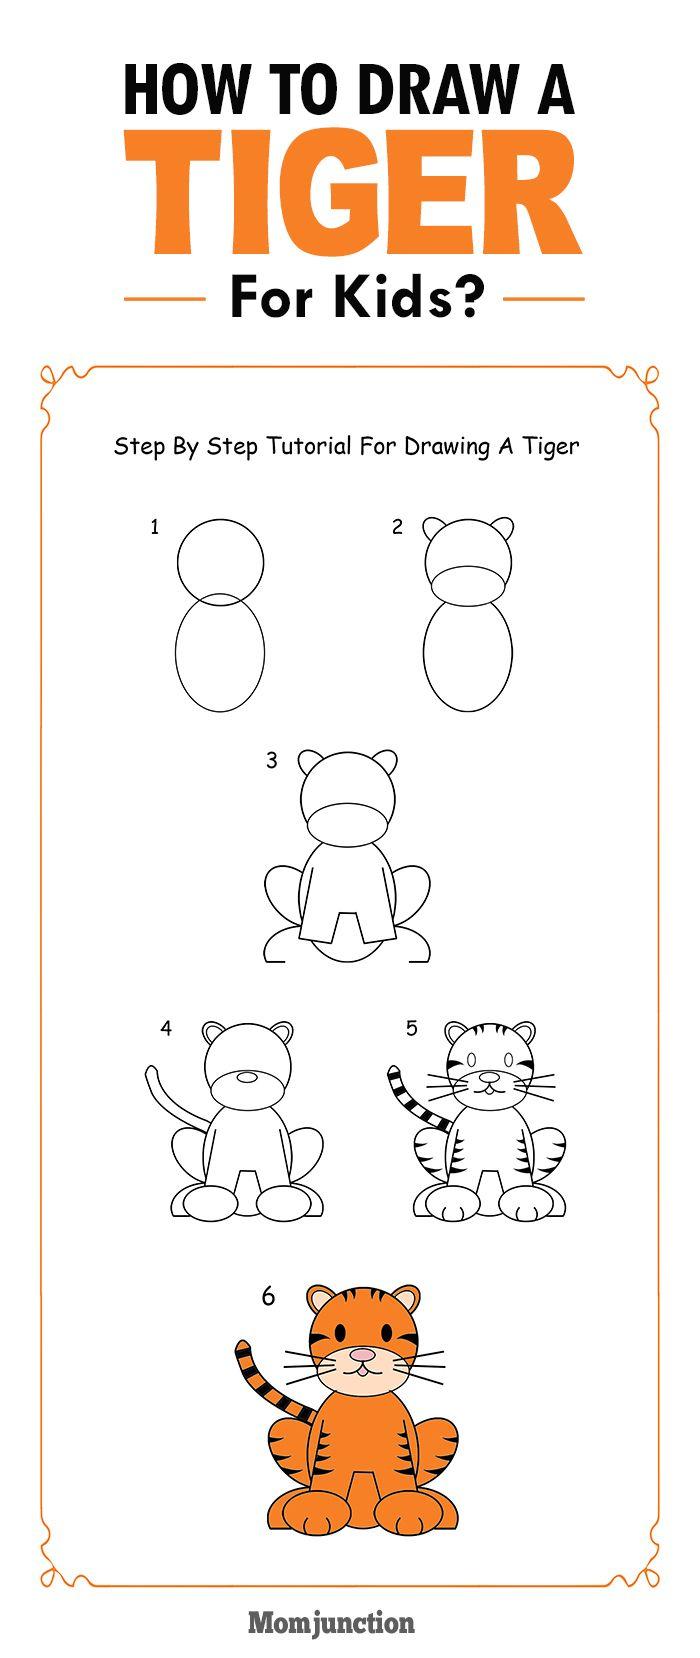 Drawn house little kid Kid Step Kids? To drawings